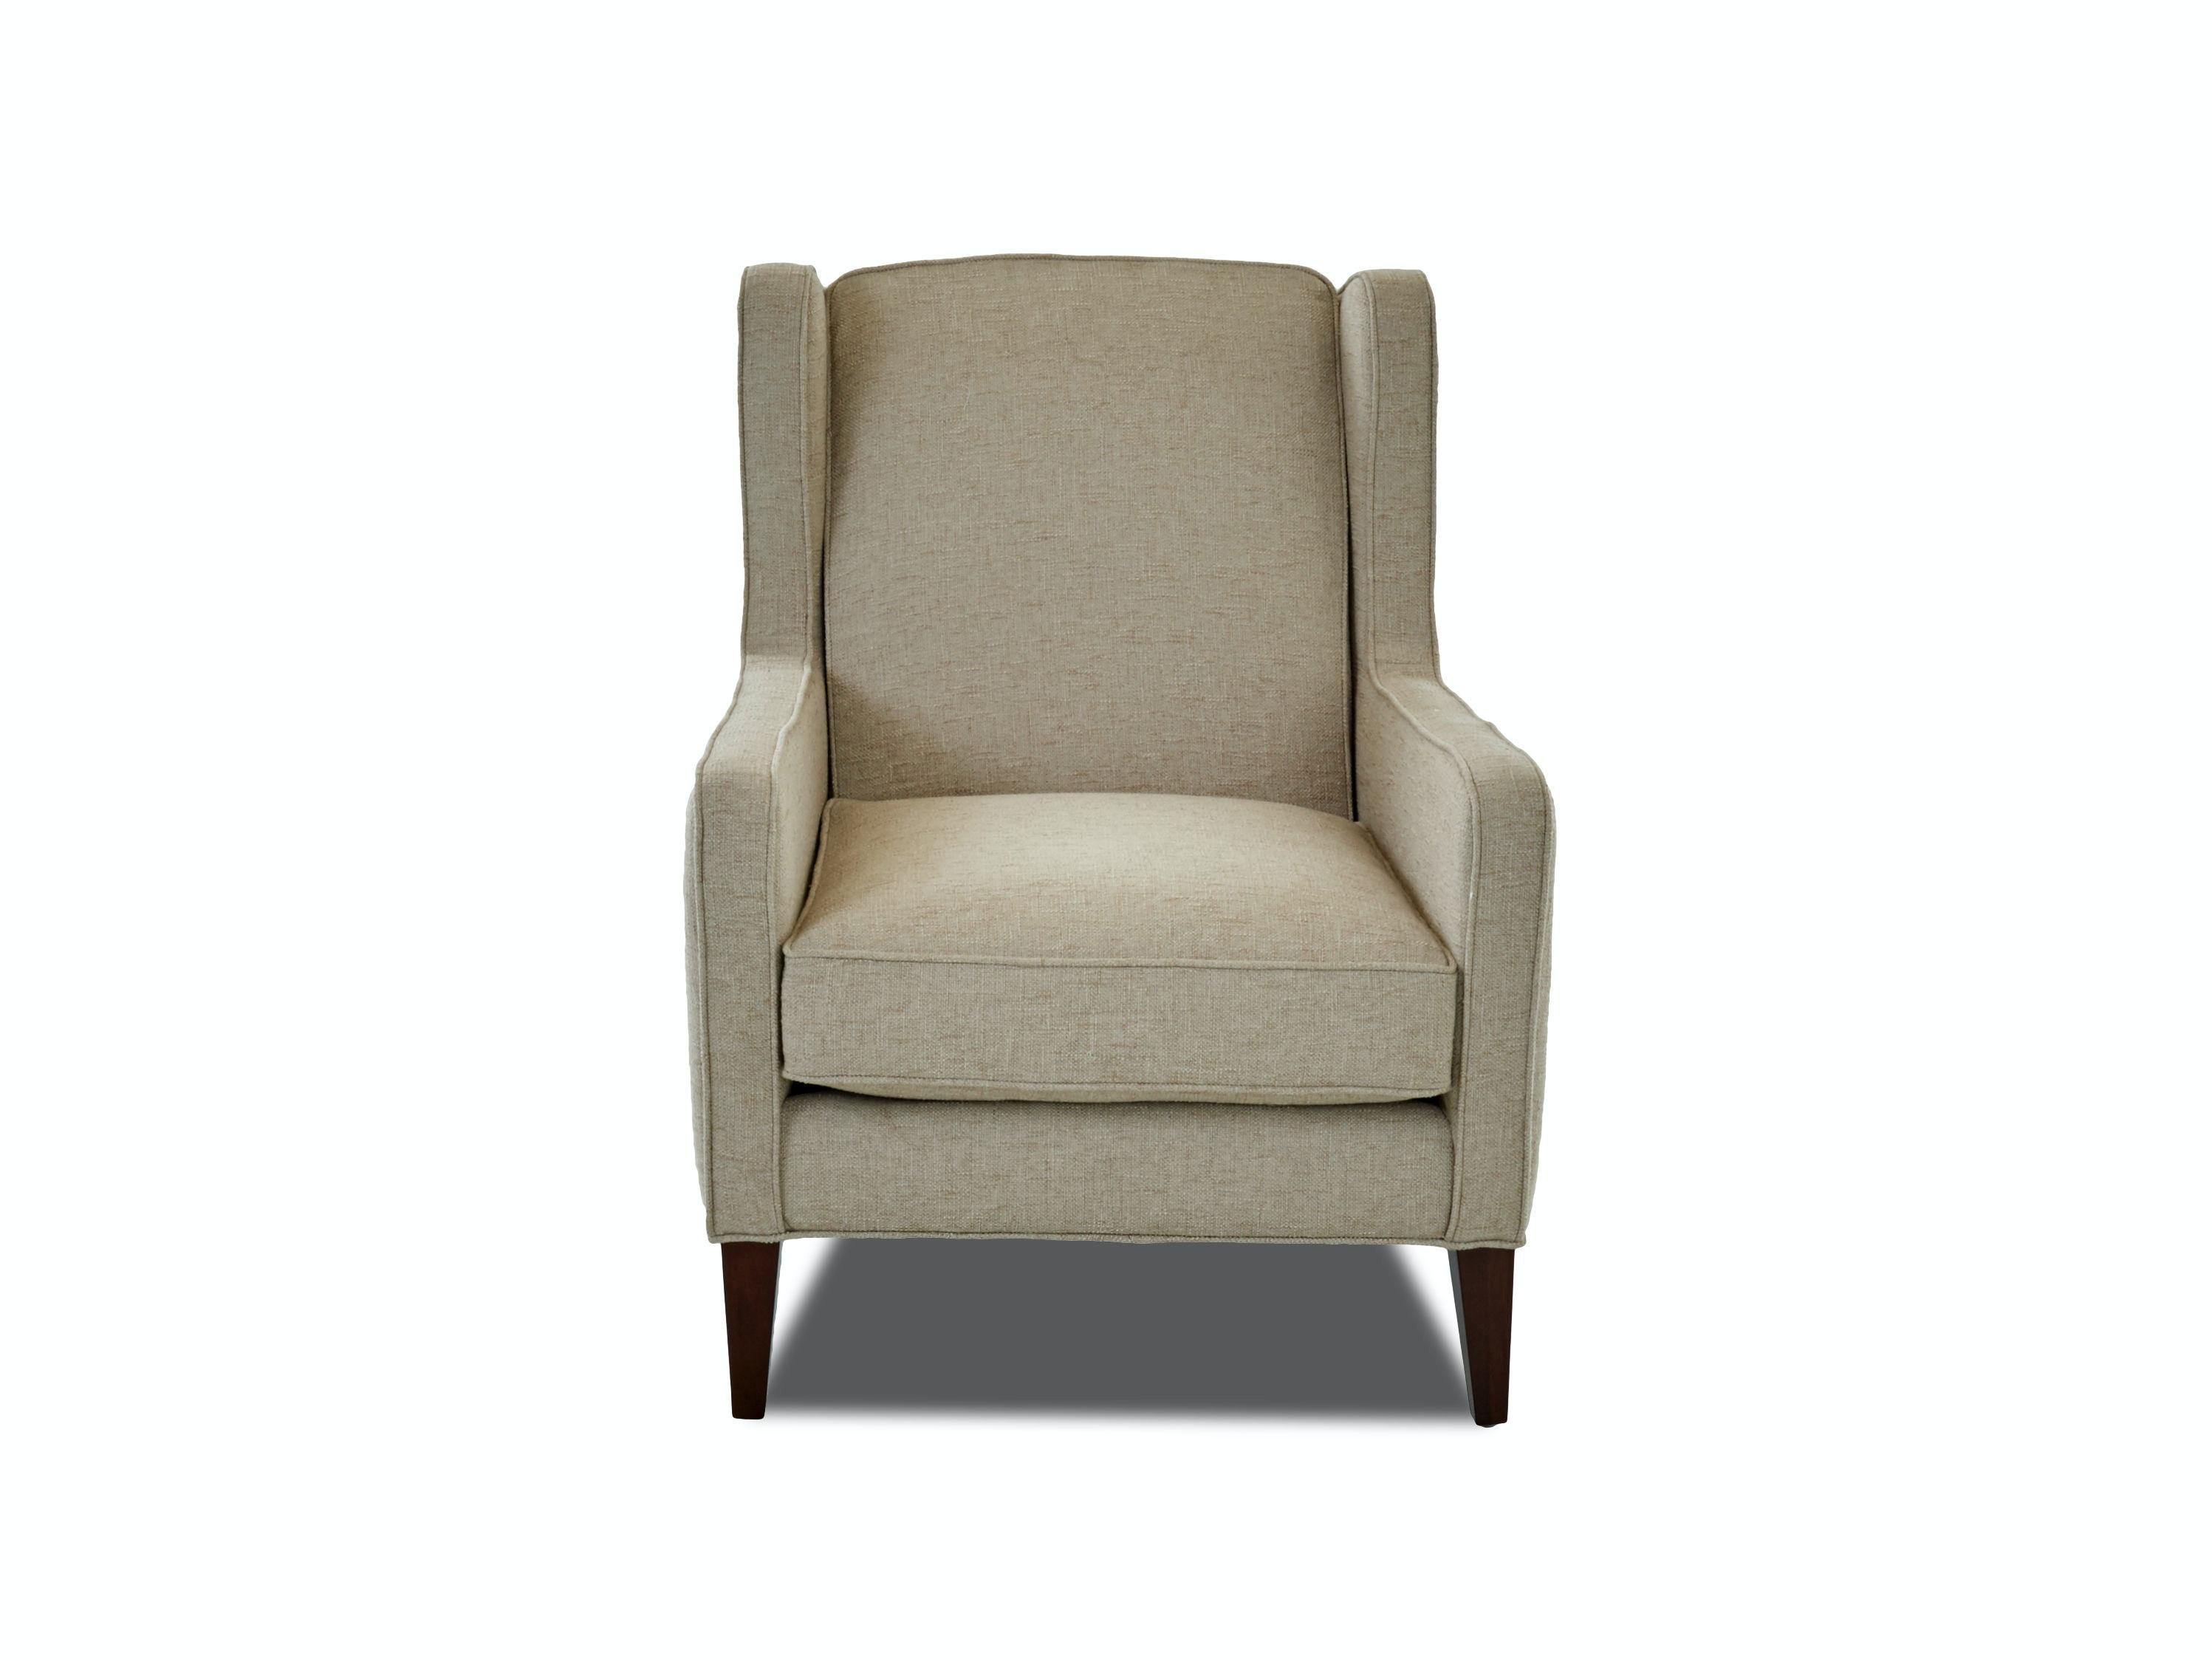 Klaussner Living Room CALEB D74800 OC   Furniture Kingdom   Gainesville, FL